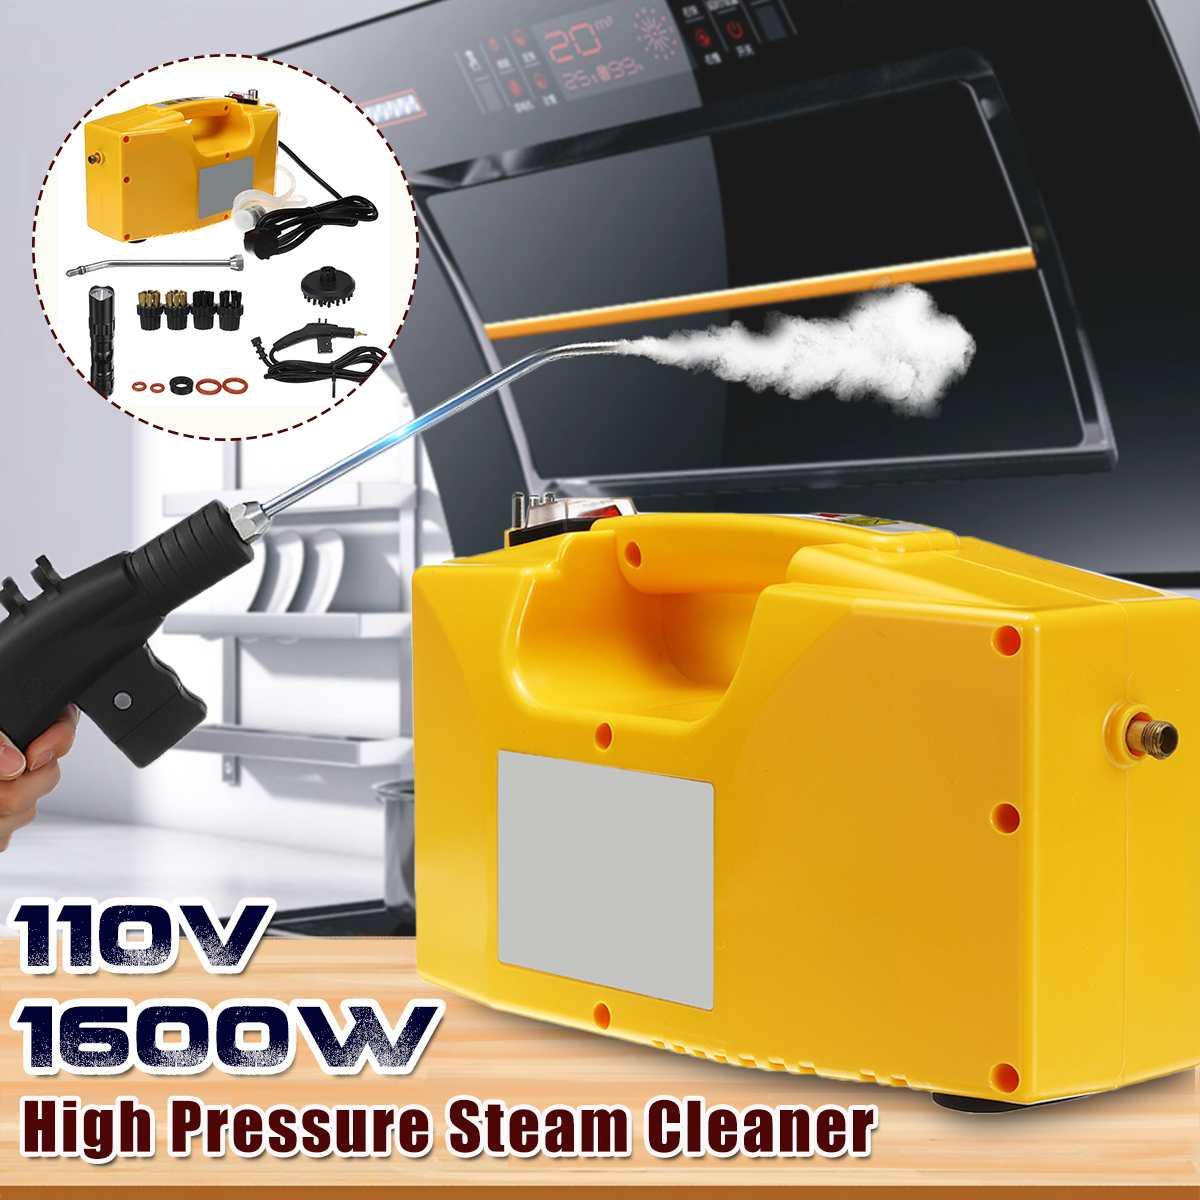 110V 1600W High Pressure Steam Cleaner Household High Temperature Steam Cleaning Machine Kitchen Sterilization Disinfector